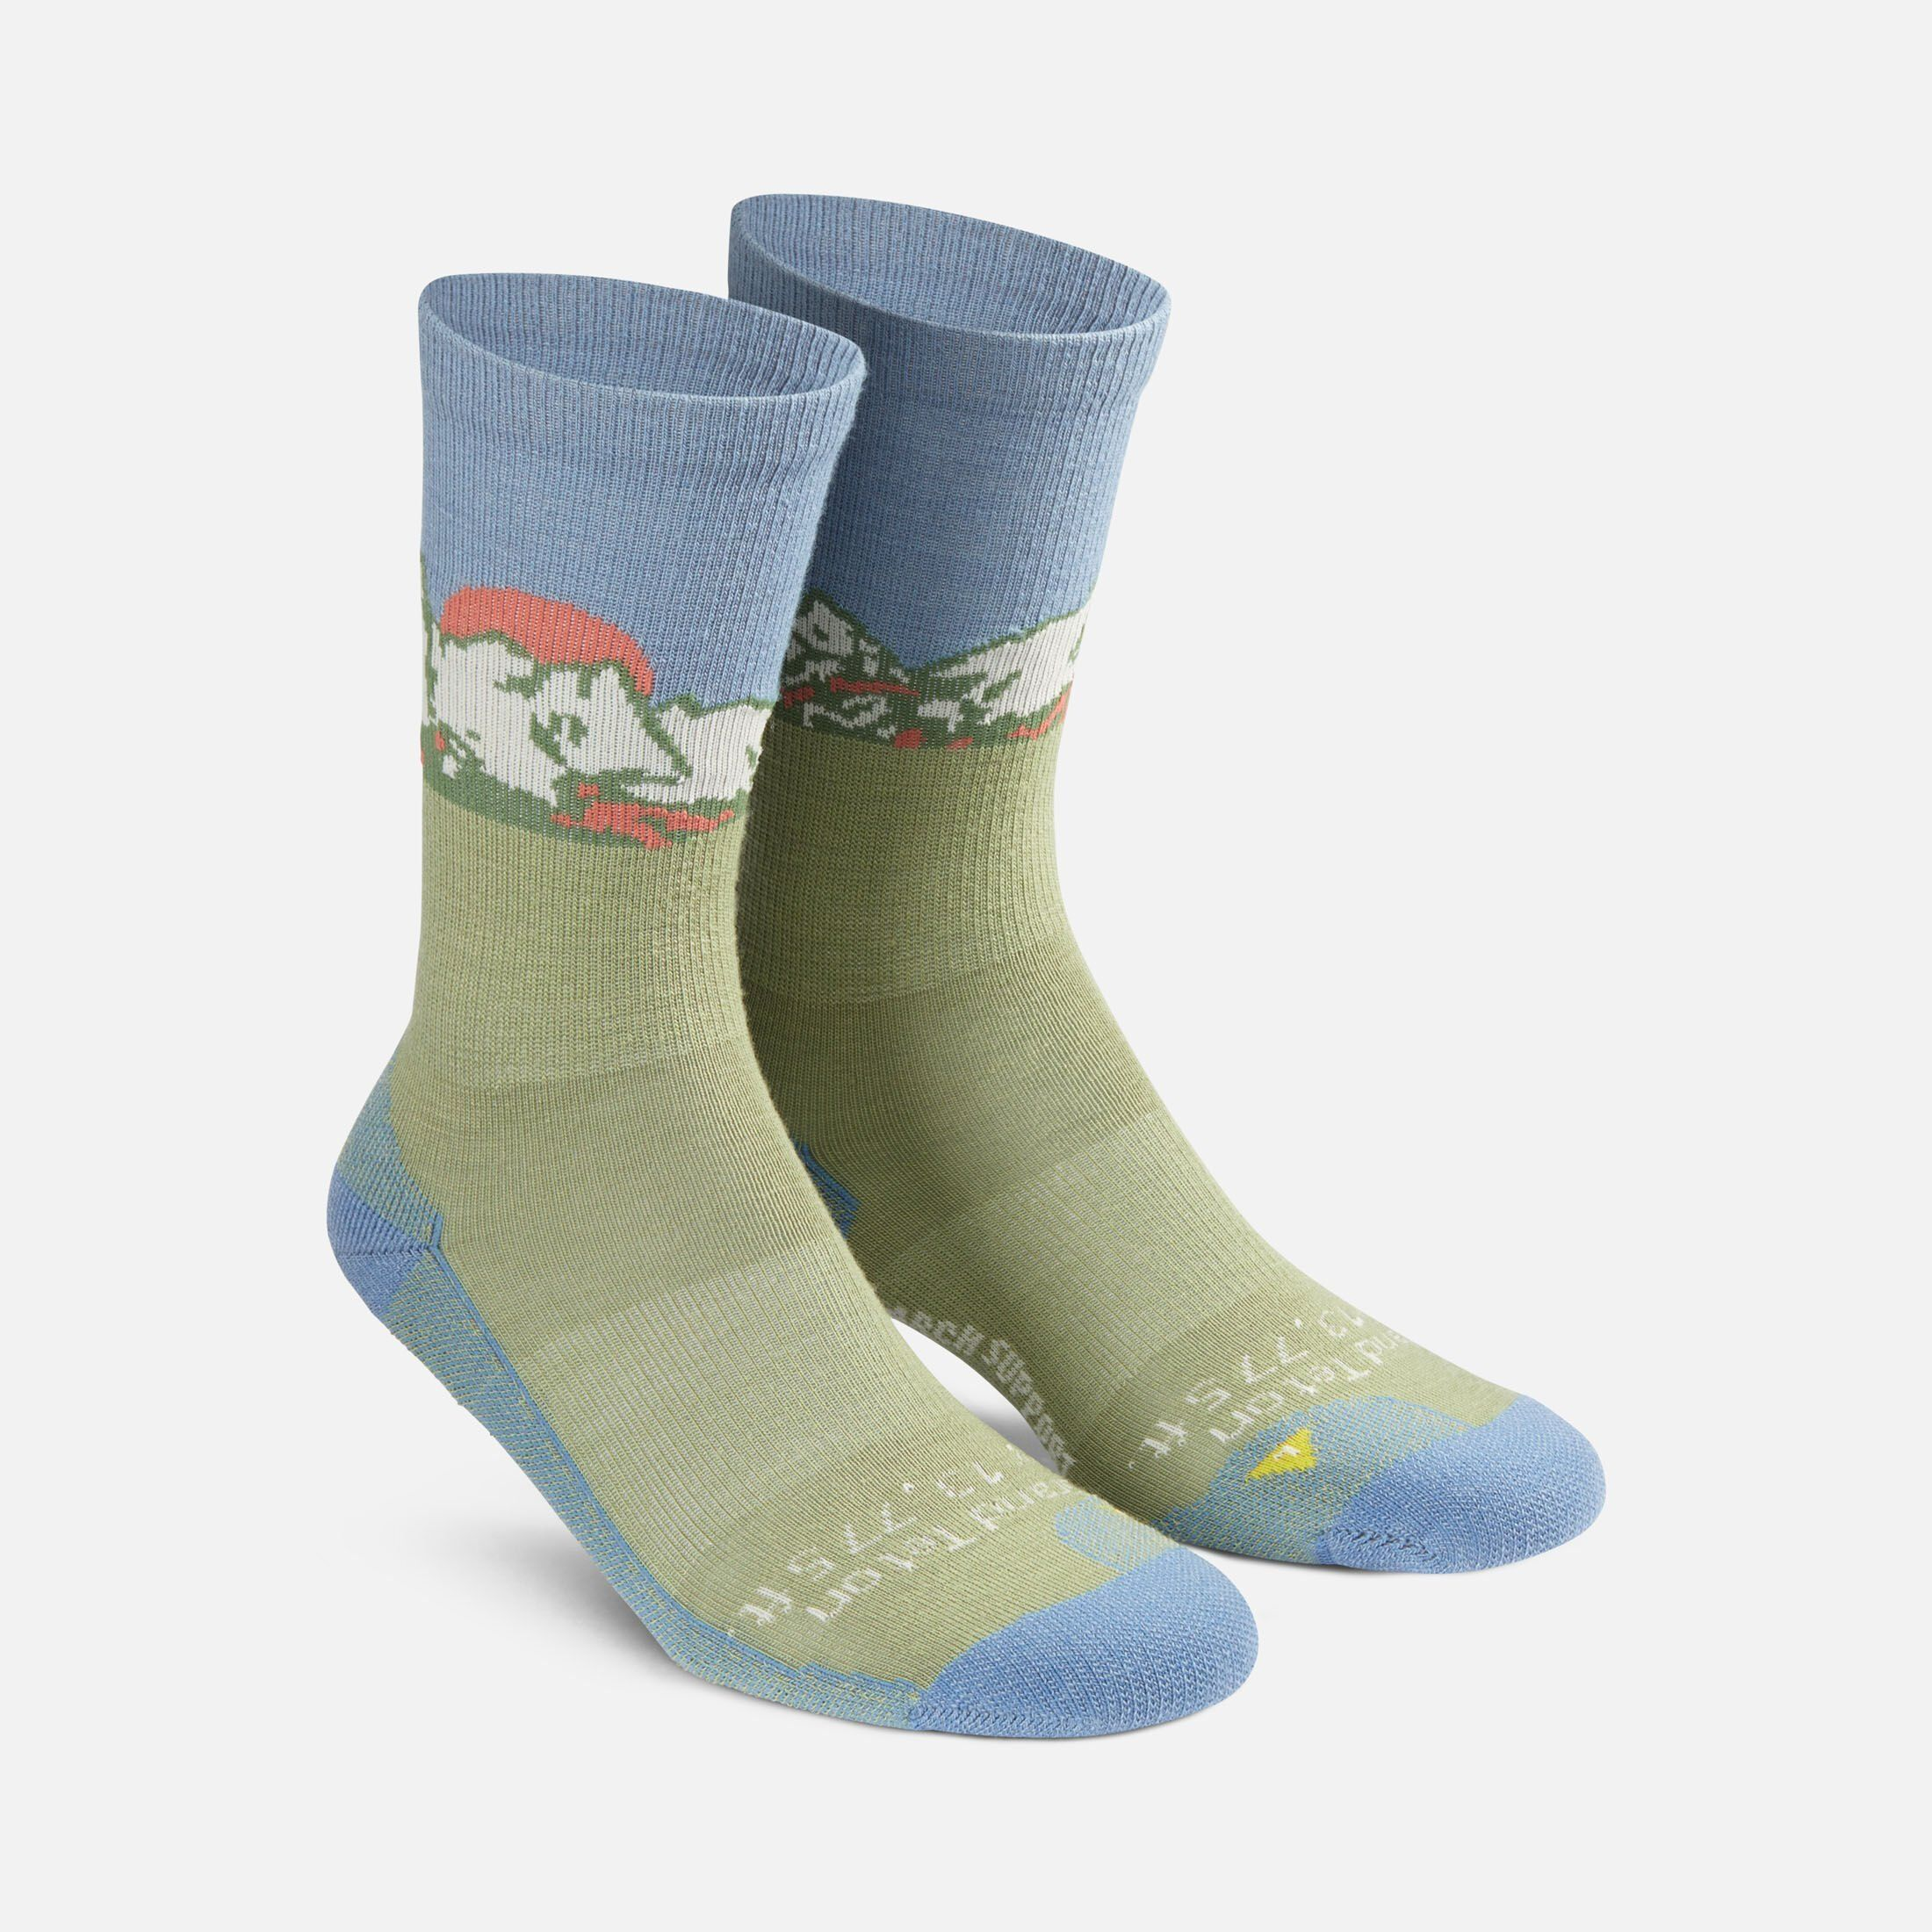 Tetons Crew Sock